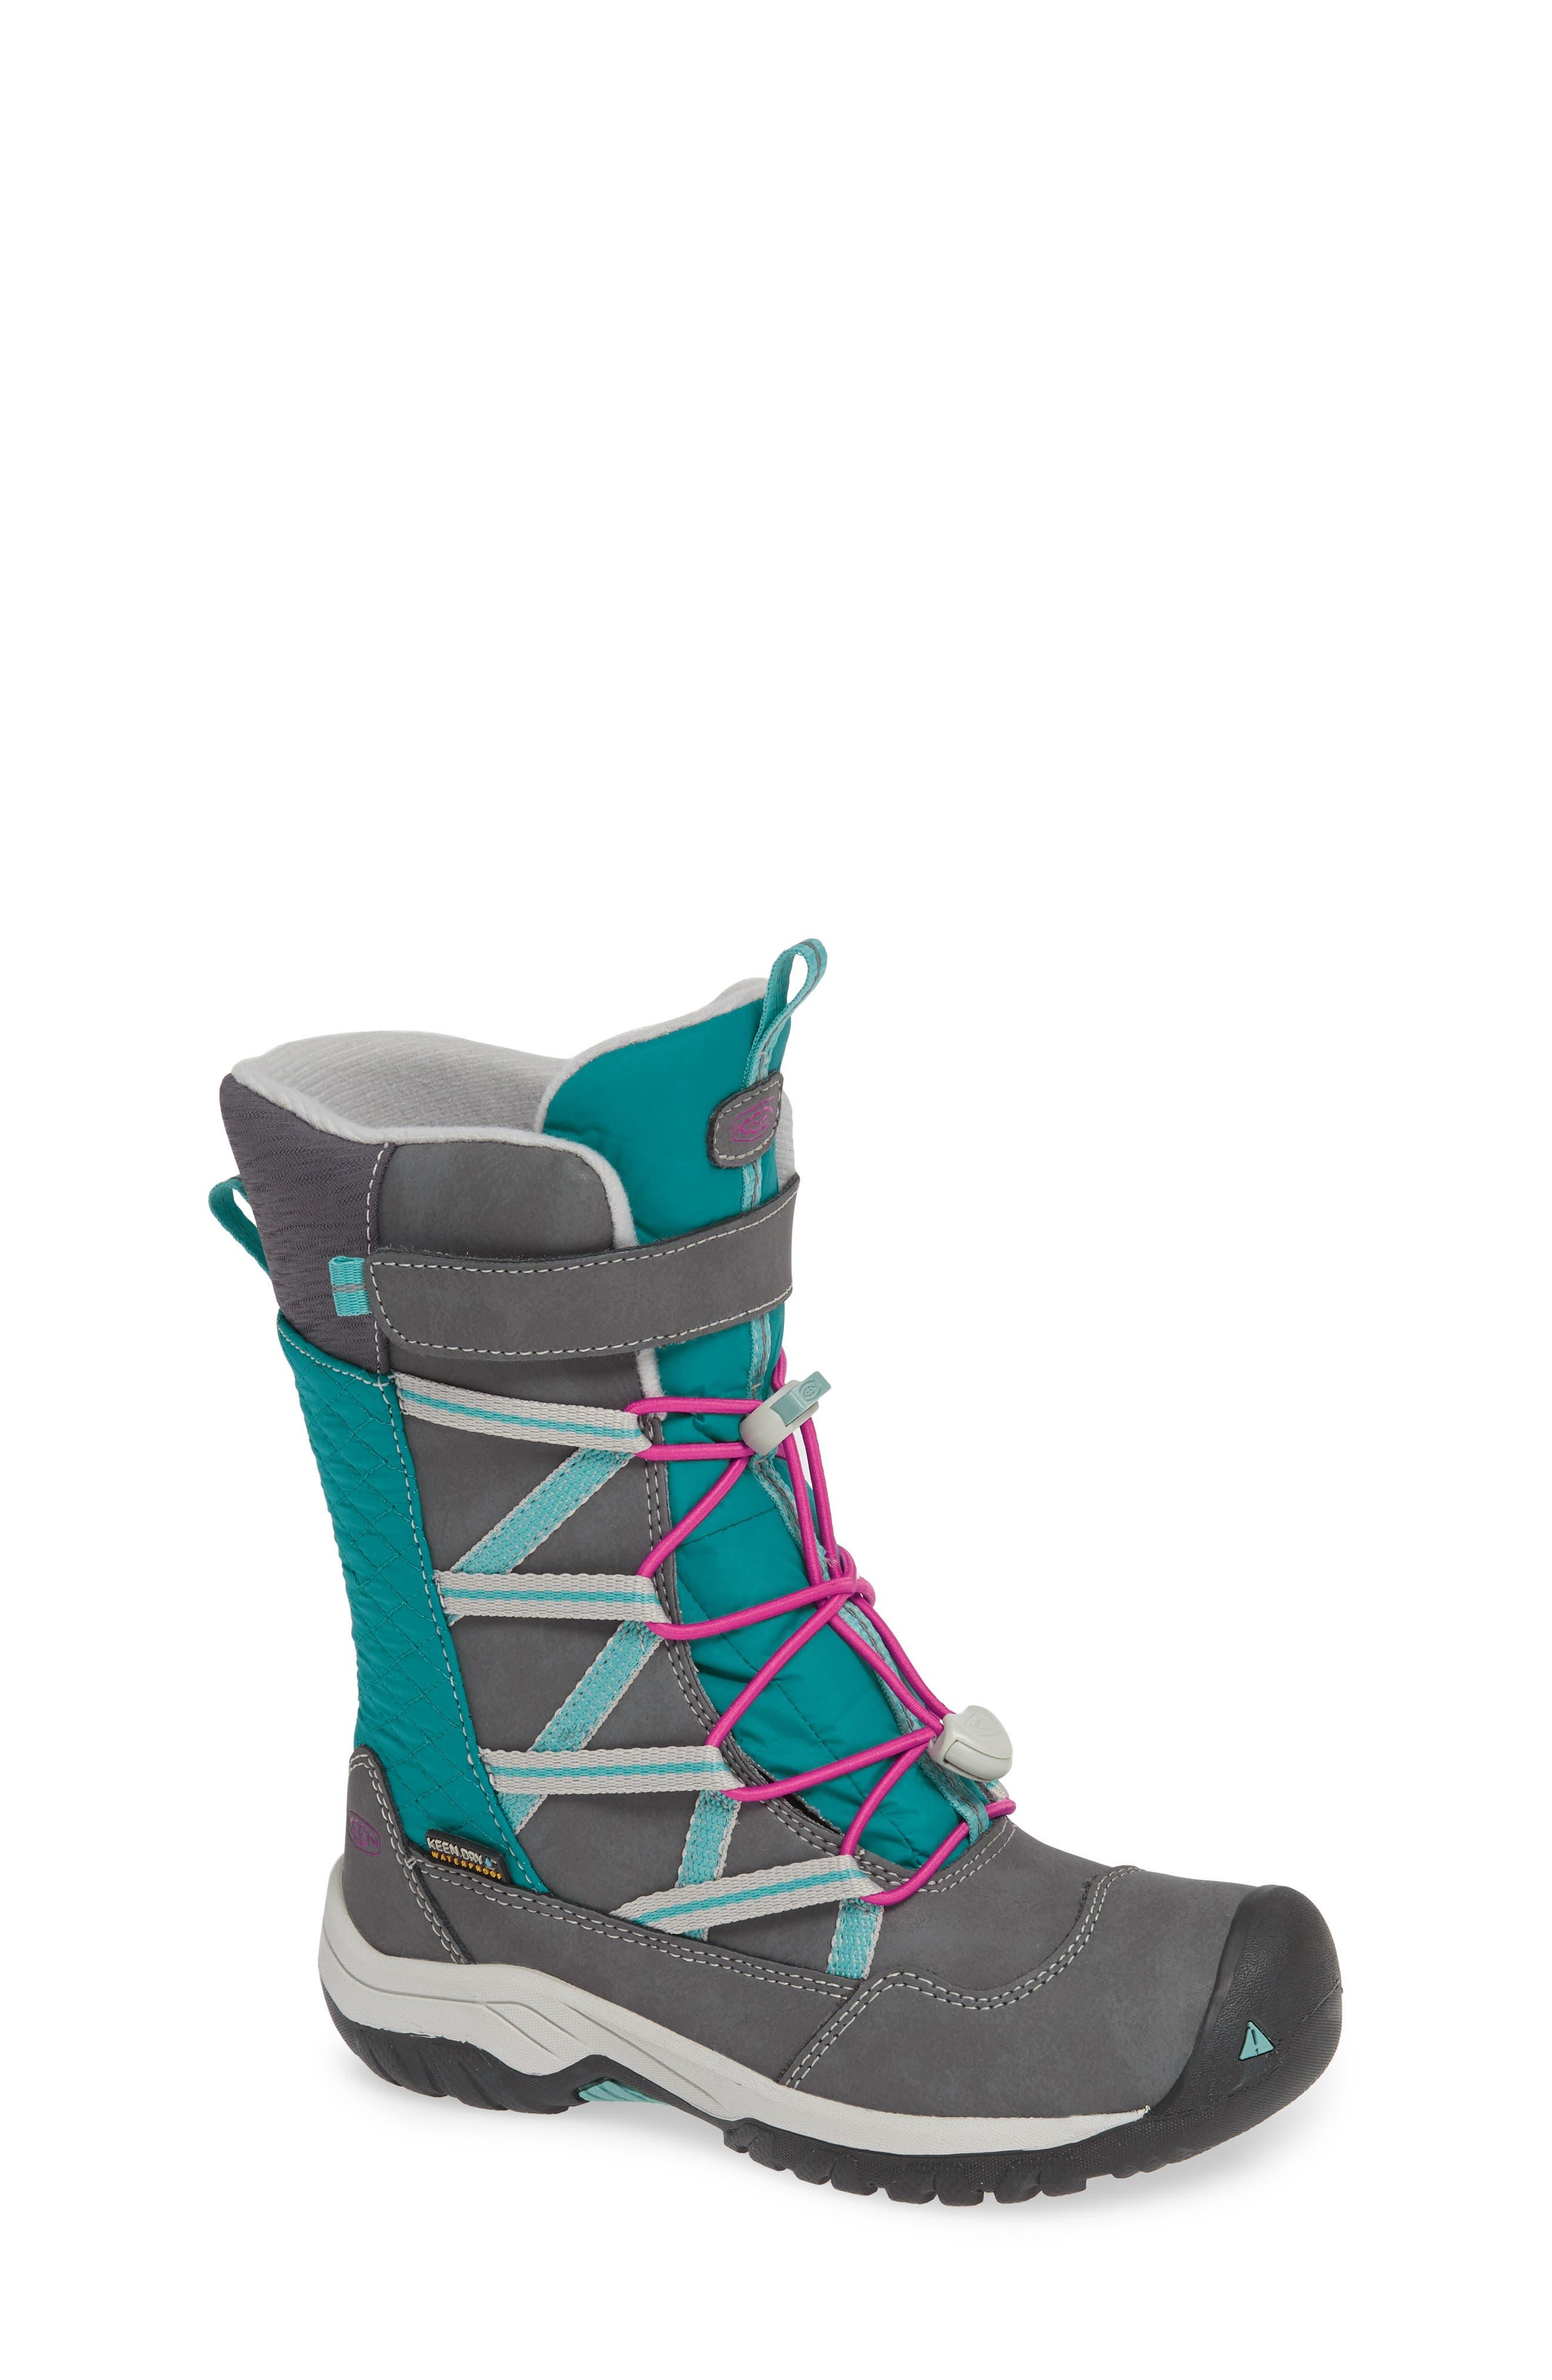 KEEN, Hoodoo Waterproof Insulated Boot, Main thumbnail 1, color, STEEL GREY/ CABARET